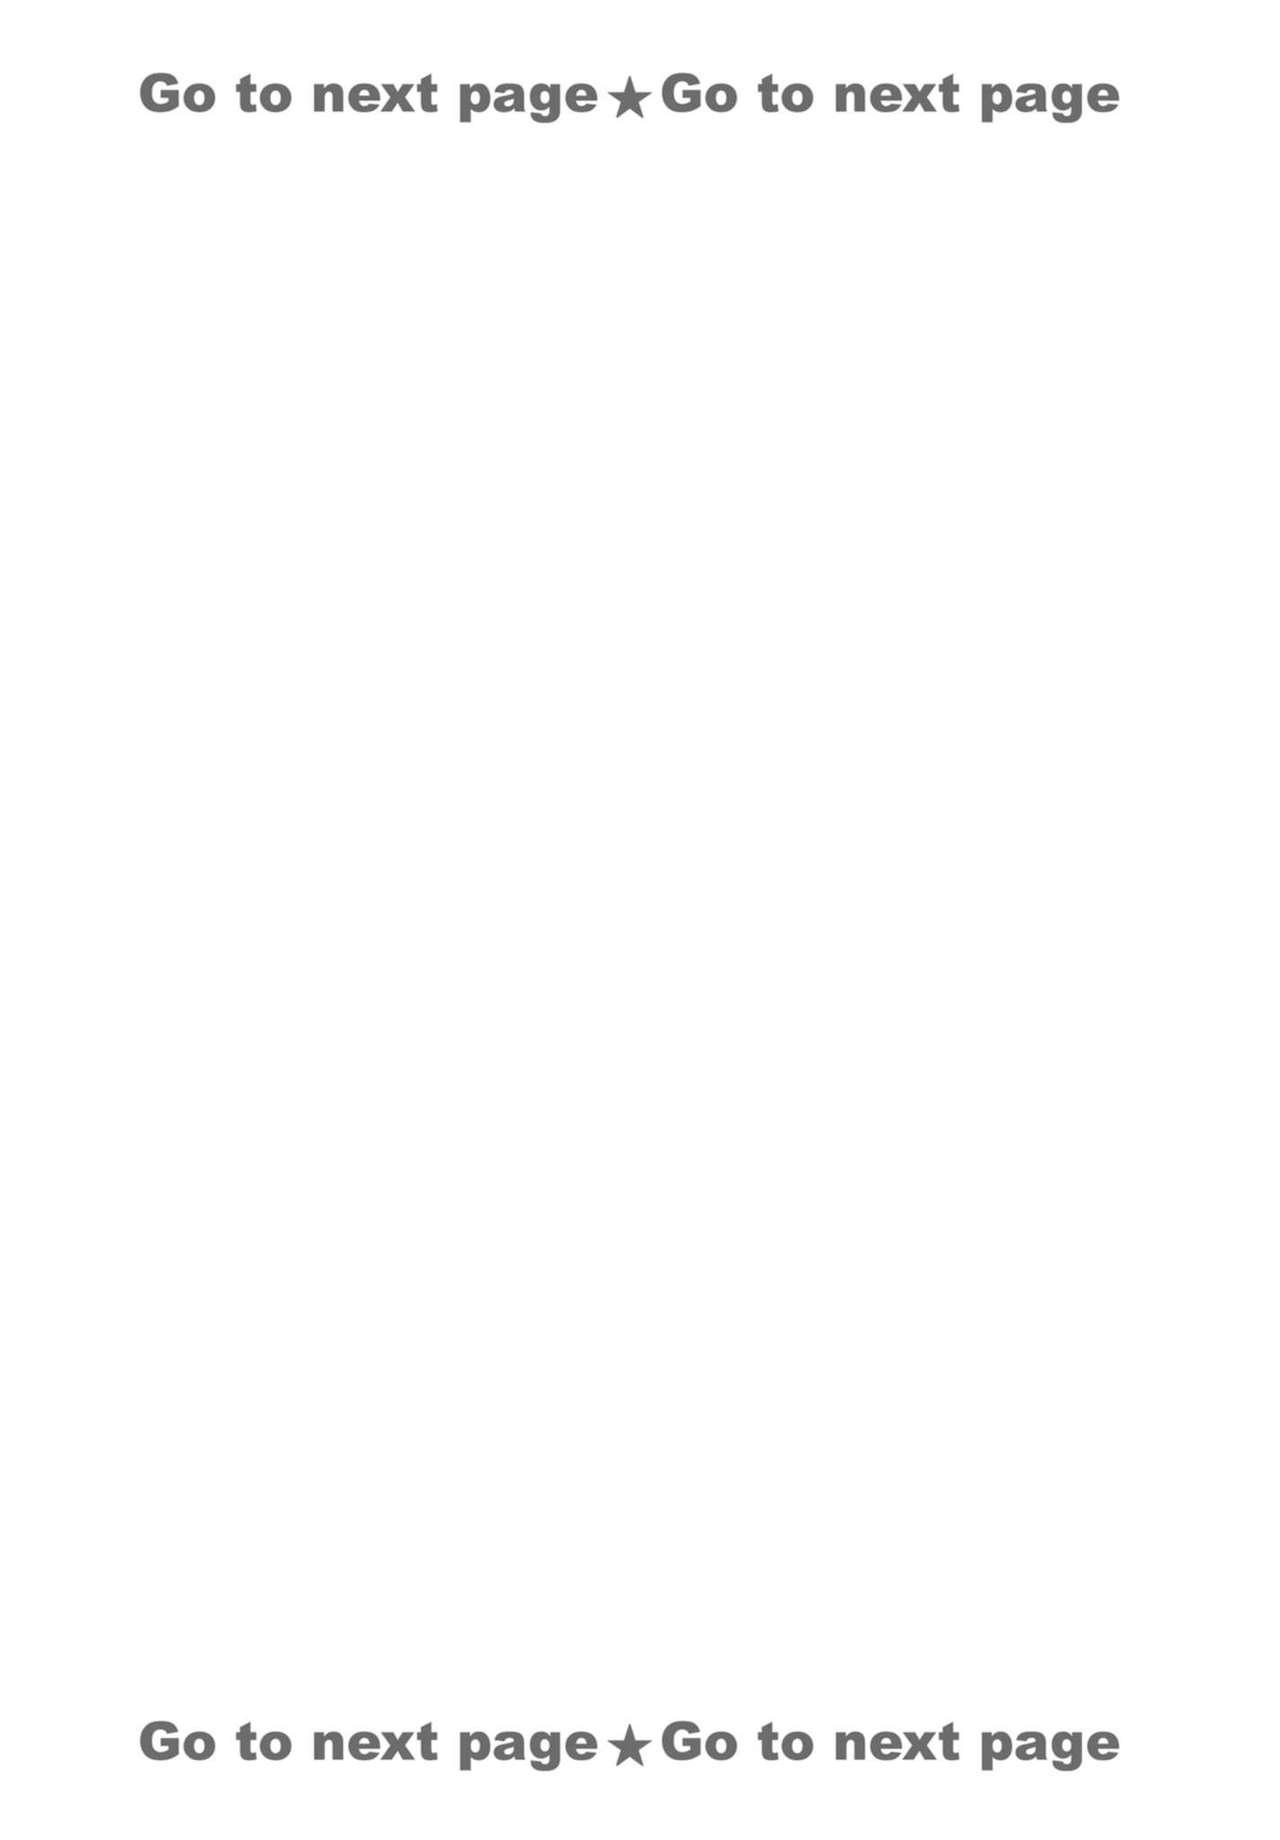 [vanilla] 4LDK Shimai Tsuki ~Muichimon OK, Tadashi Doutei ni Kagiru | 四房一衛一廳附姊妹 ~身無分文OK,但僅限處男~ Ch. 2 [Chinese] 1